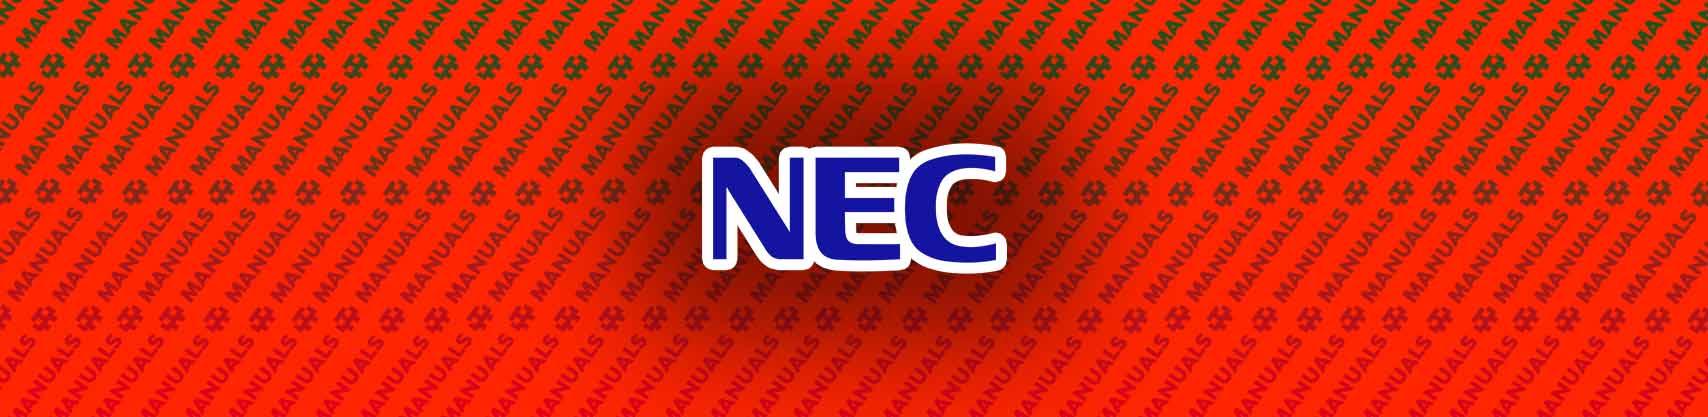 NEC SL1100 Manual